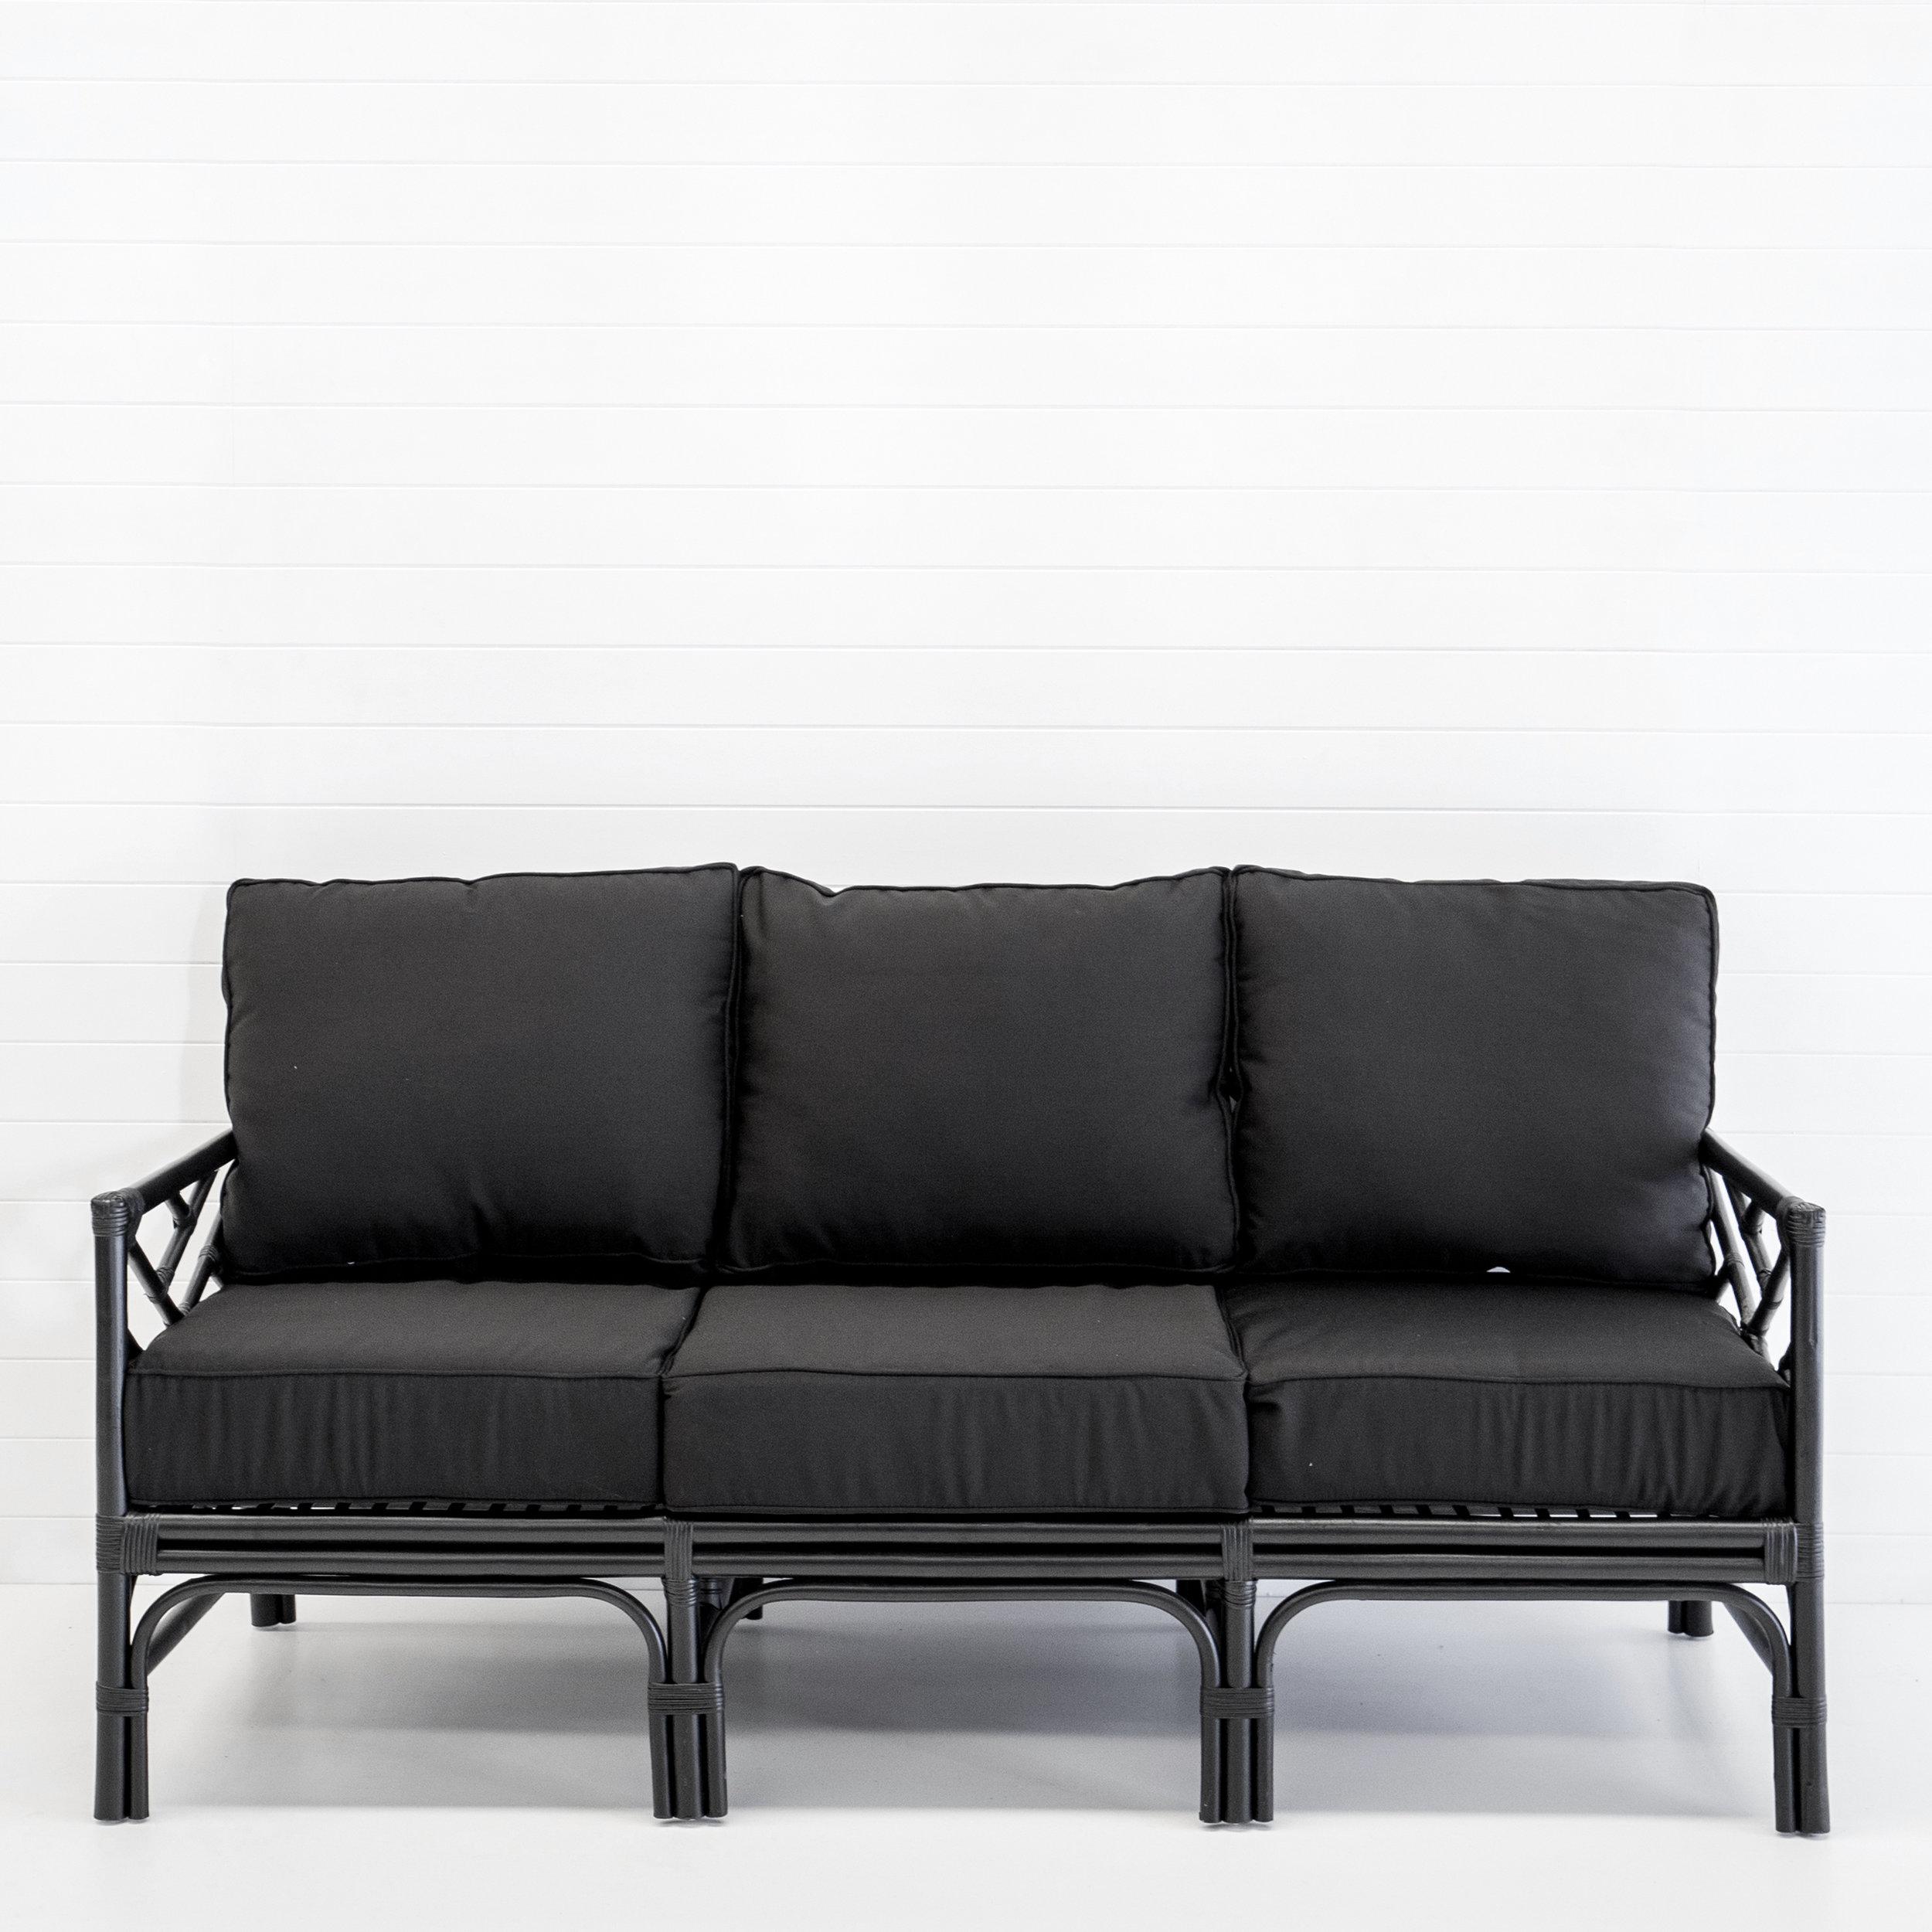 Hamptons black 3-seater sofa with black cushions